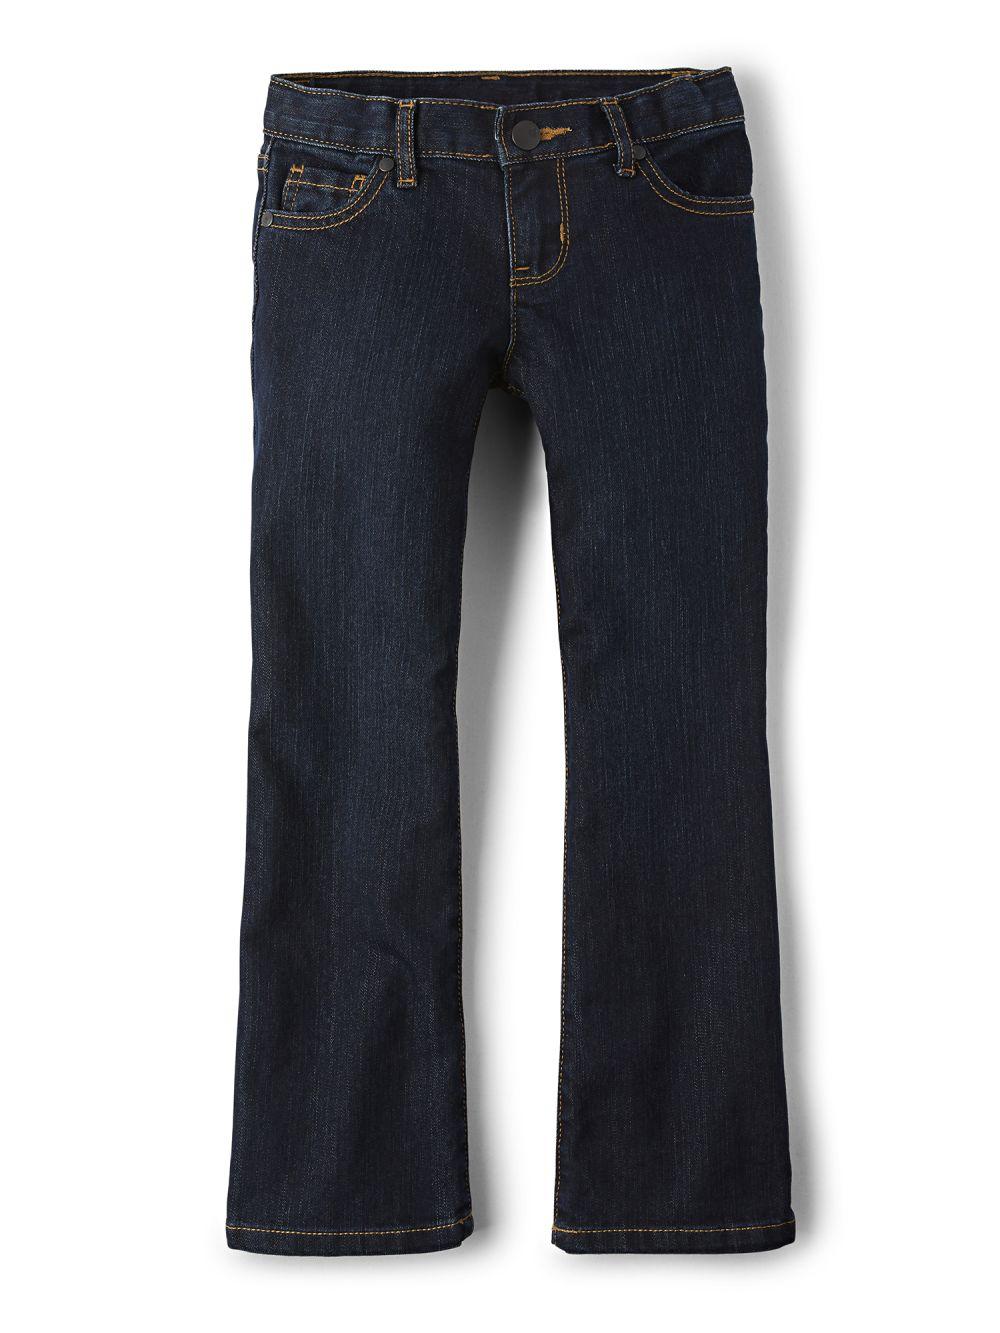 Best Girls Basic Bootcut Jeans